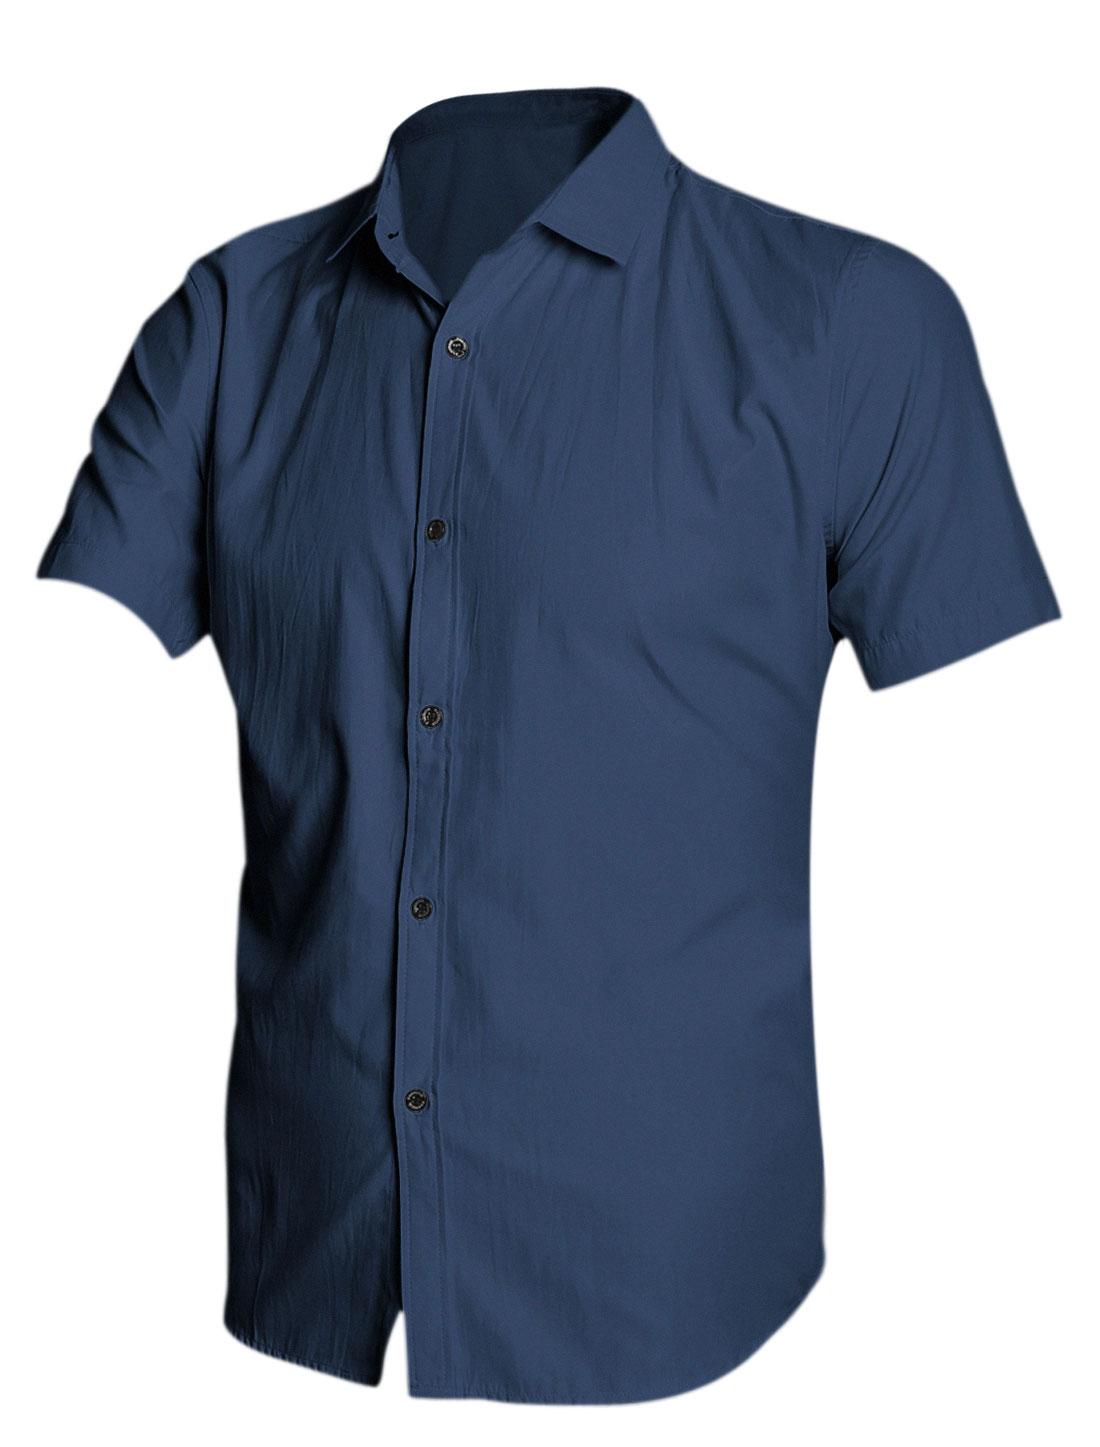 Man Basic Collar Short Sleeves Button Down Shirts Navy Blue M